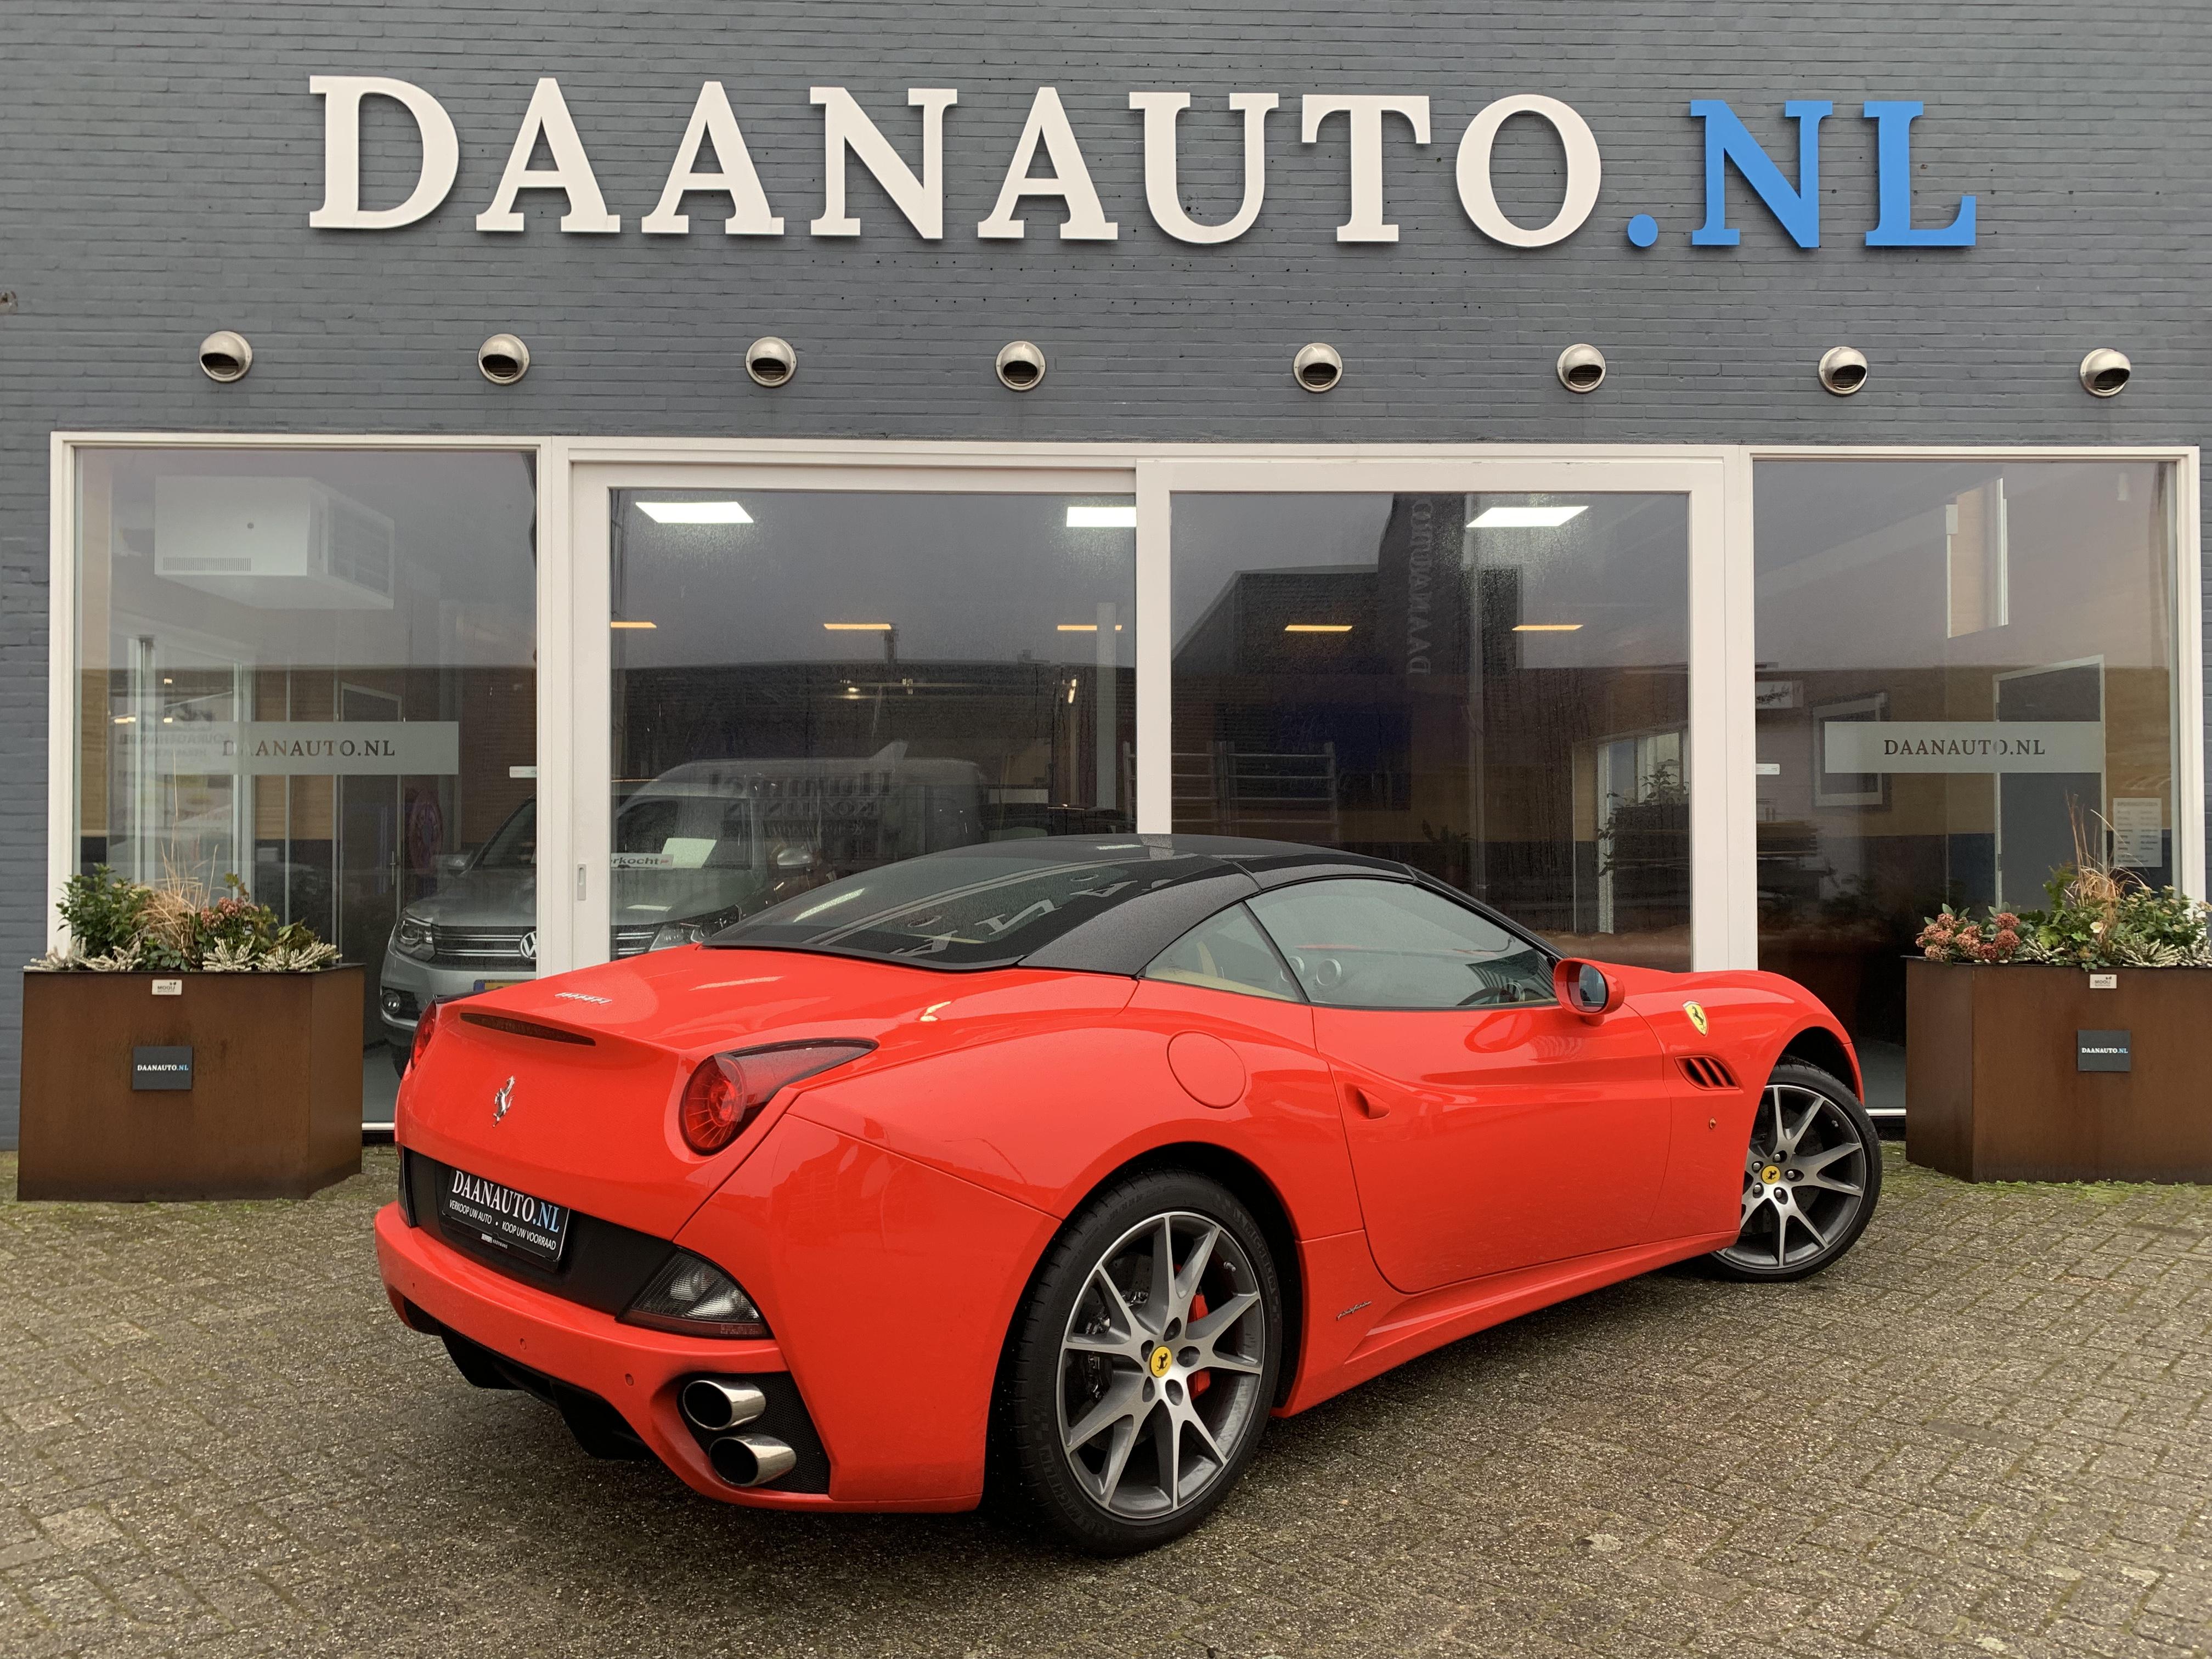 Ferrari California 4.3L V8 460 PK - Daanauto